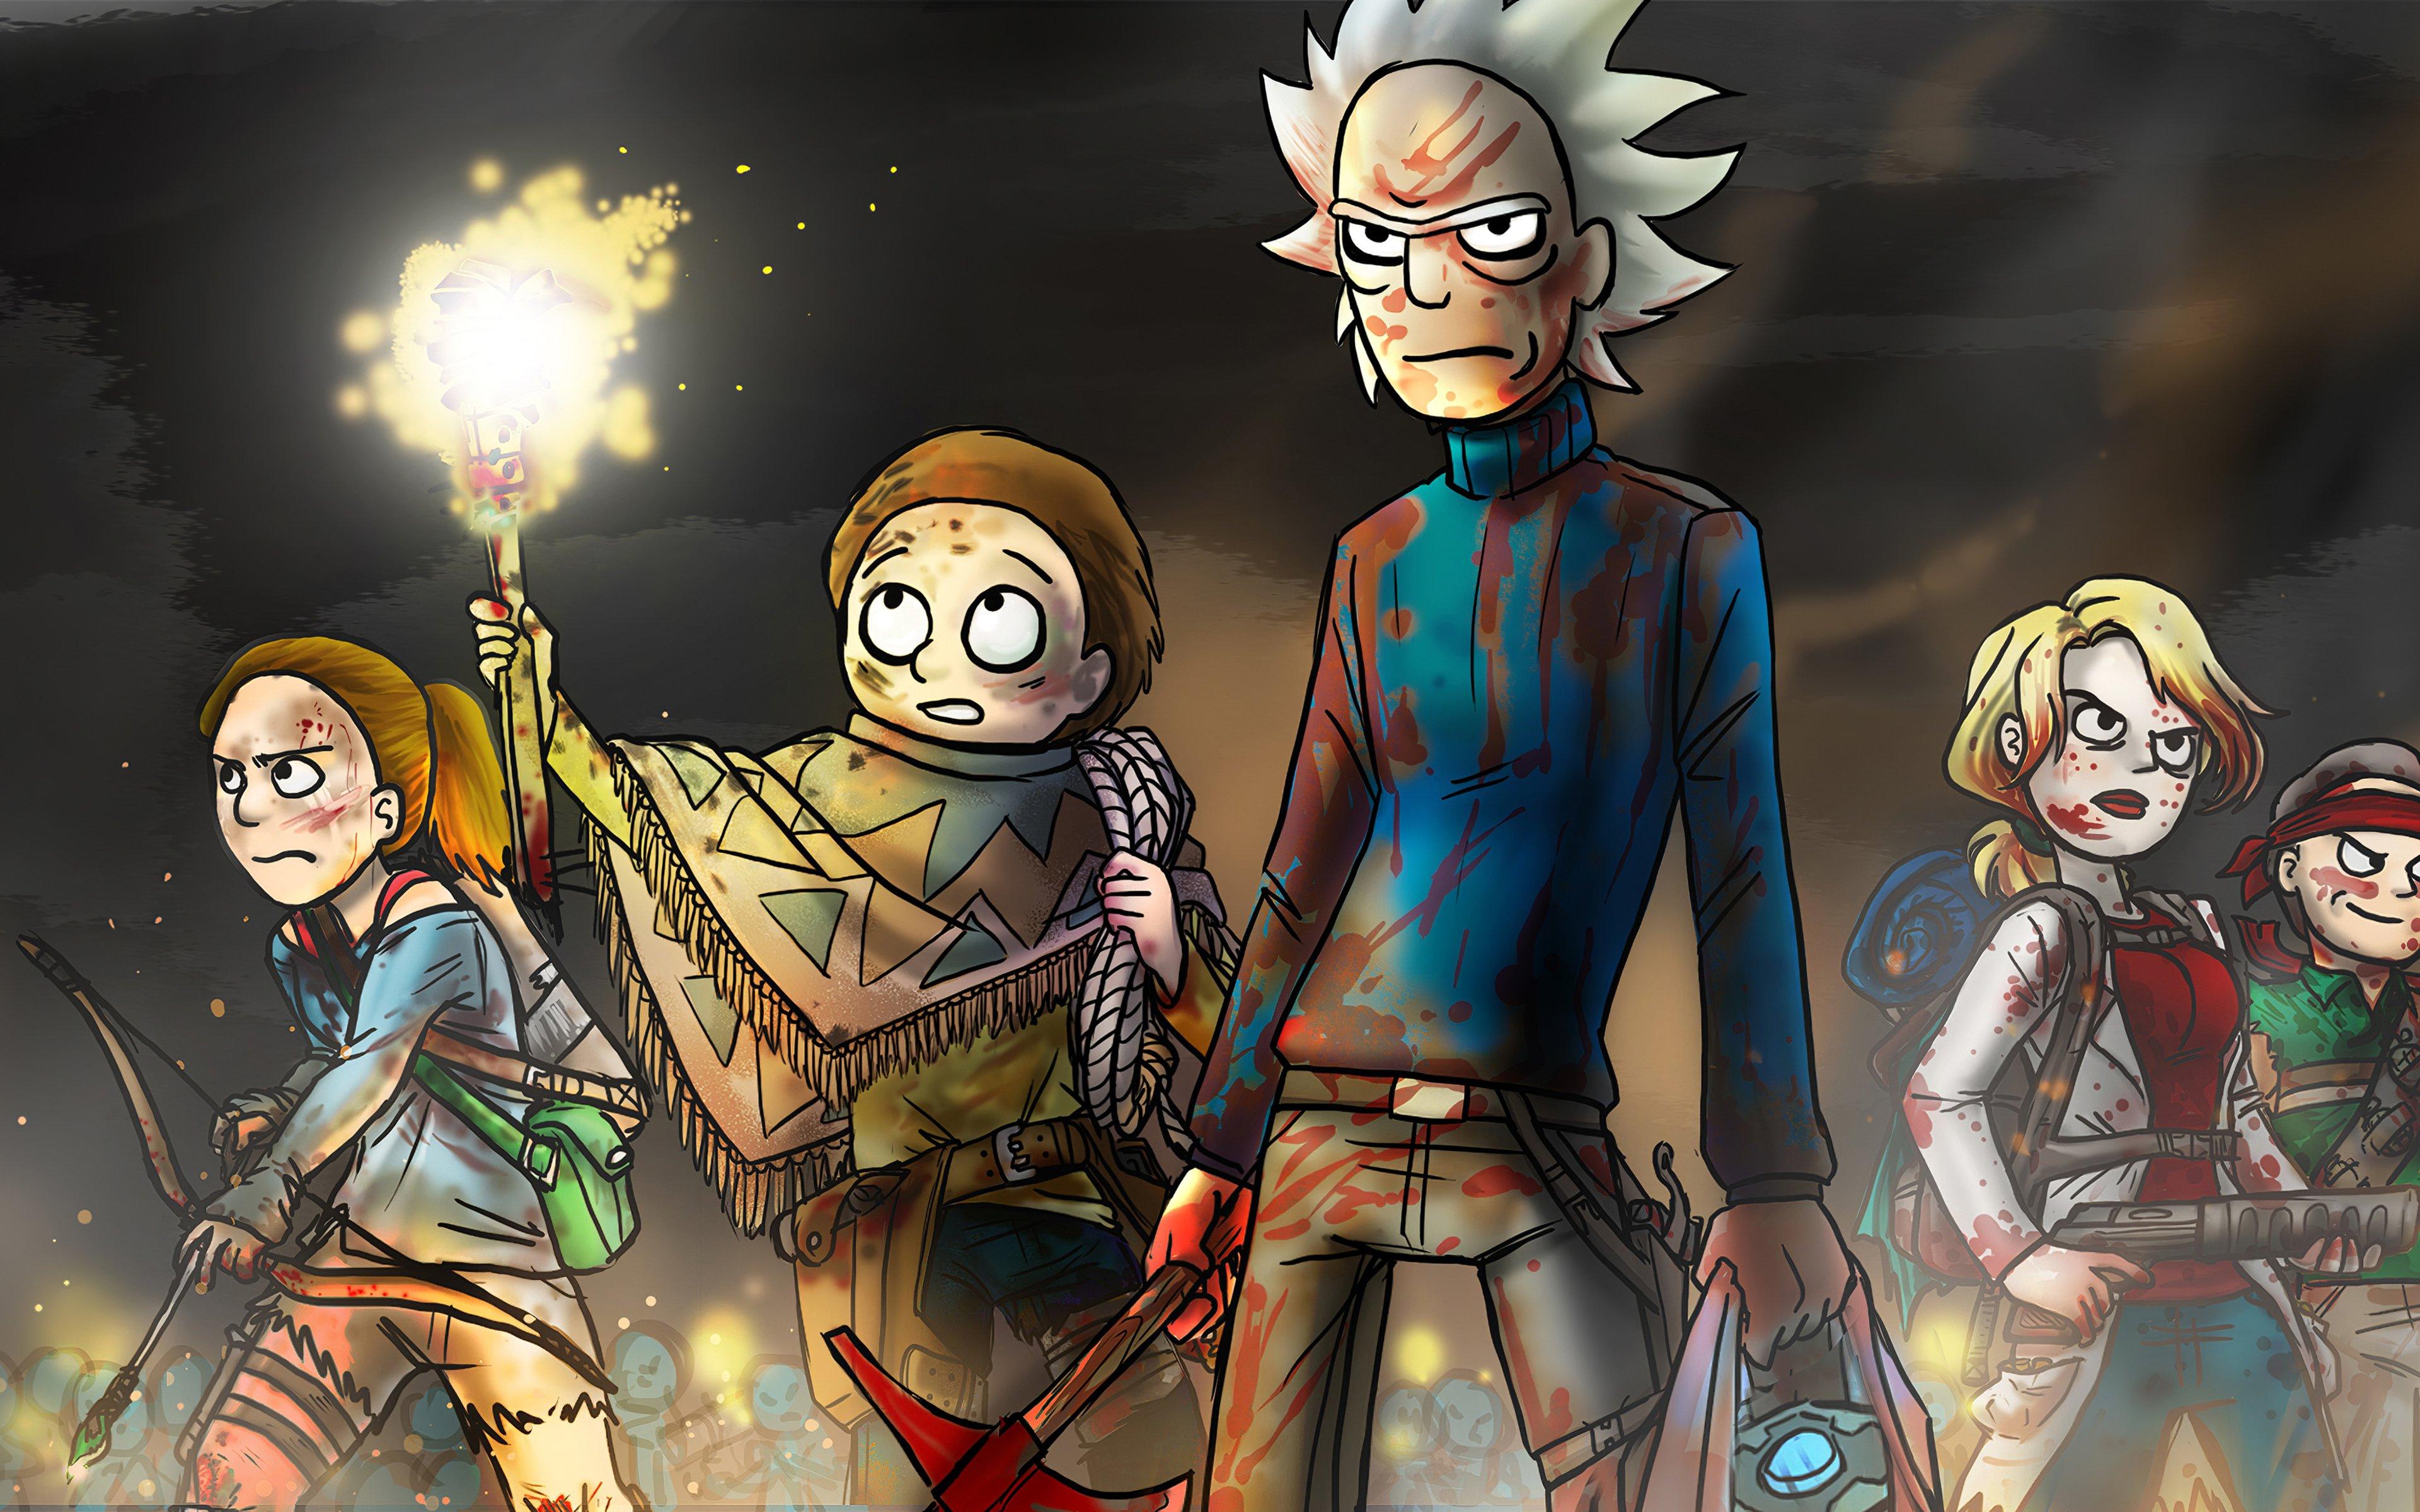 Ultra Hd Rick And Morty Wallpaper 4k